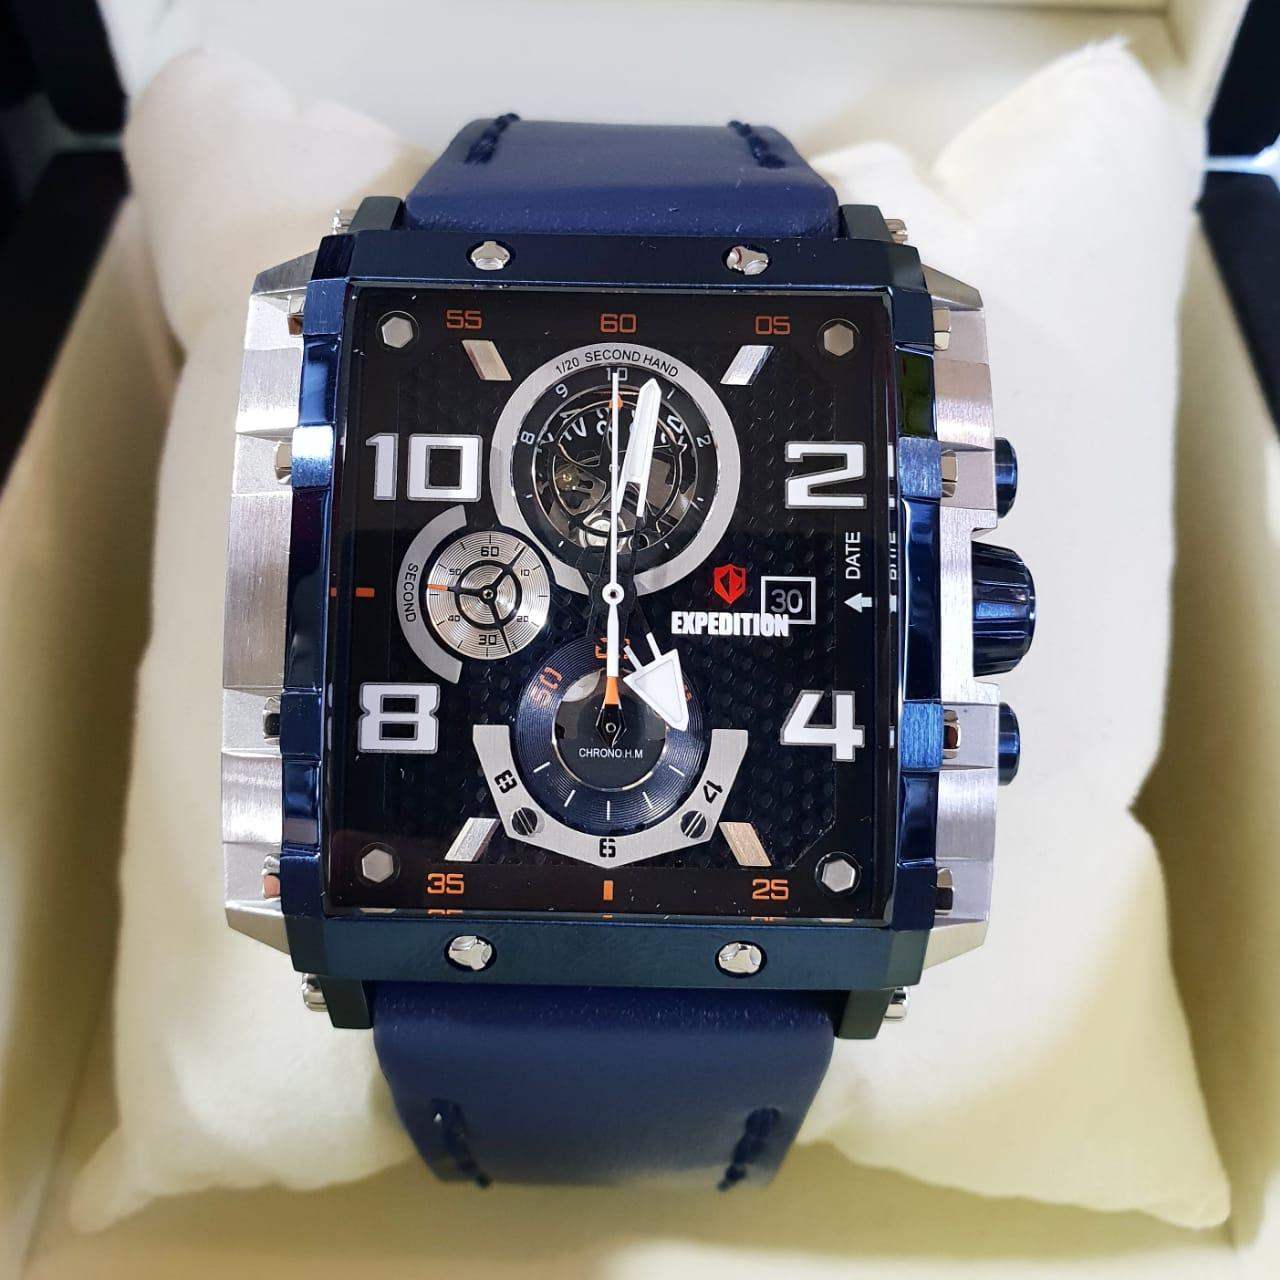 Jam Tangan Expedition Terbaru E 6381silver Black Original E6757m Pria Stainless Leather